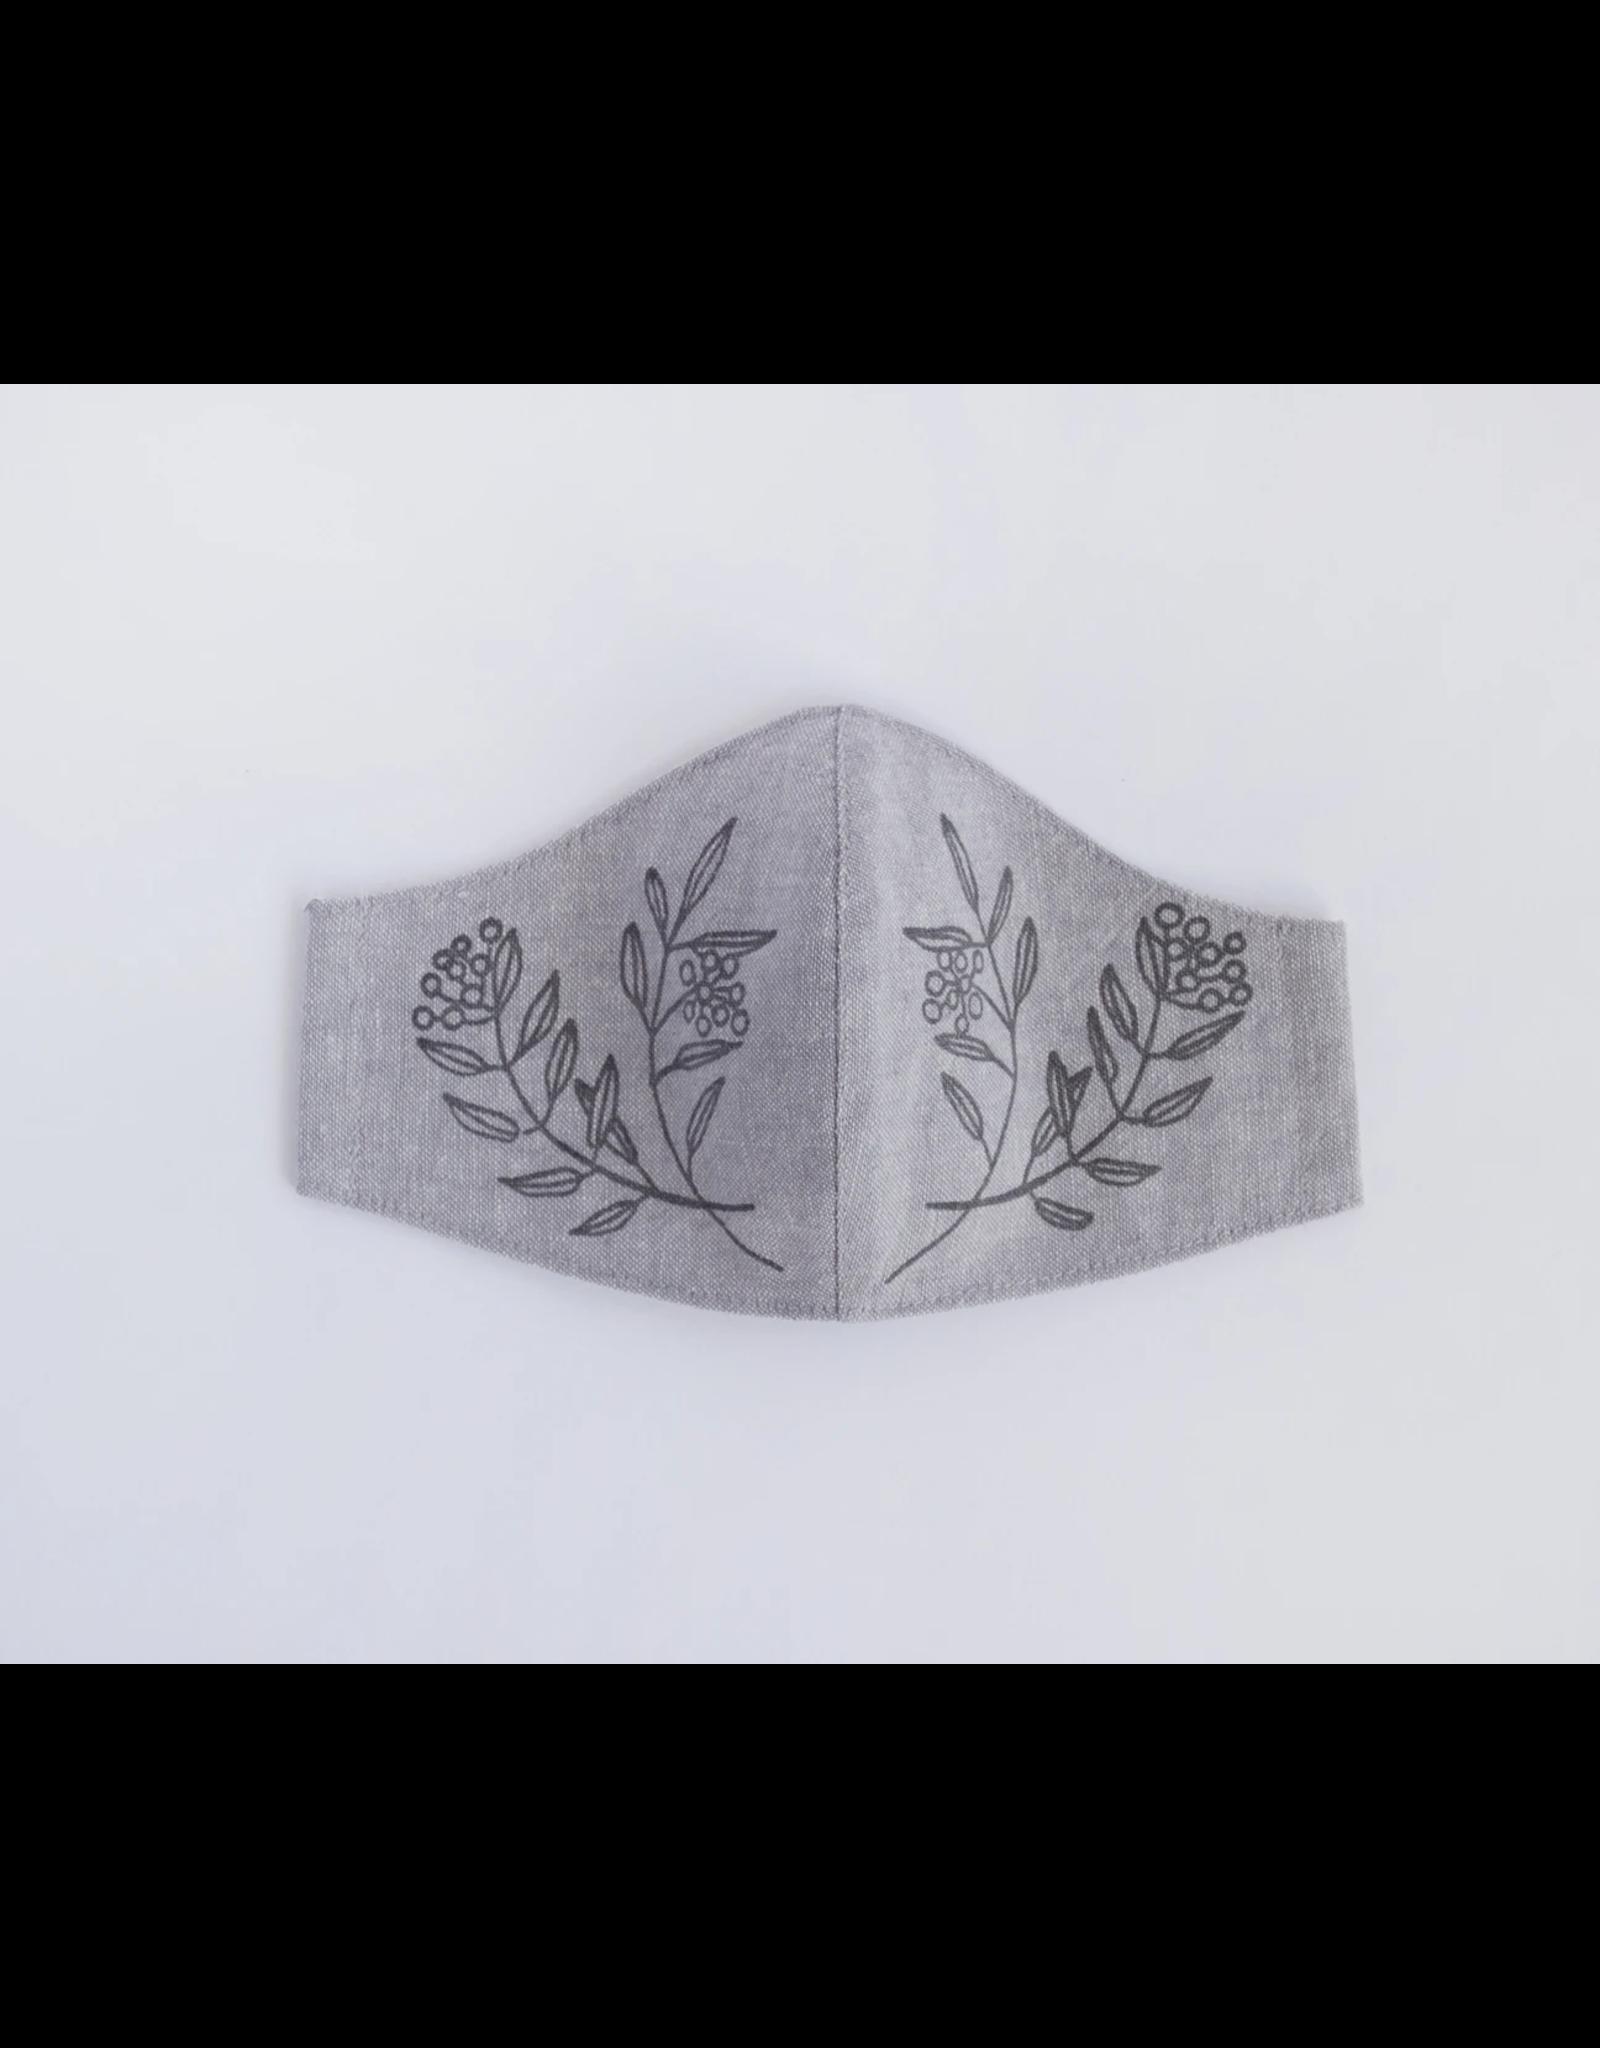 Handmade Linen Mask - Sprig